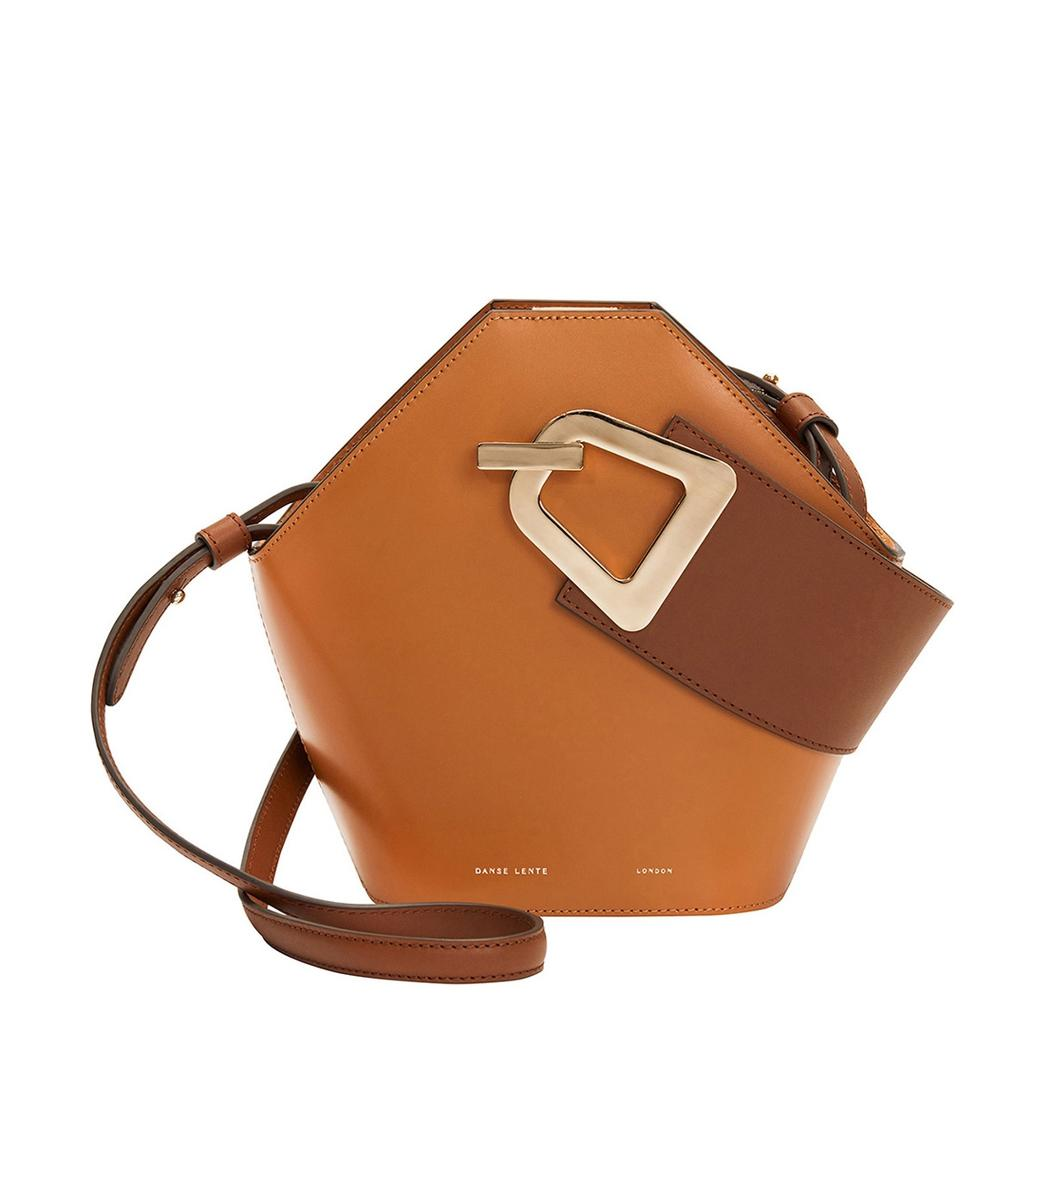 b0b7a4ca028a Lyst - Danse Lente Mini Johnny Bucket Bag In Bicolor in Brown